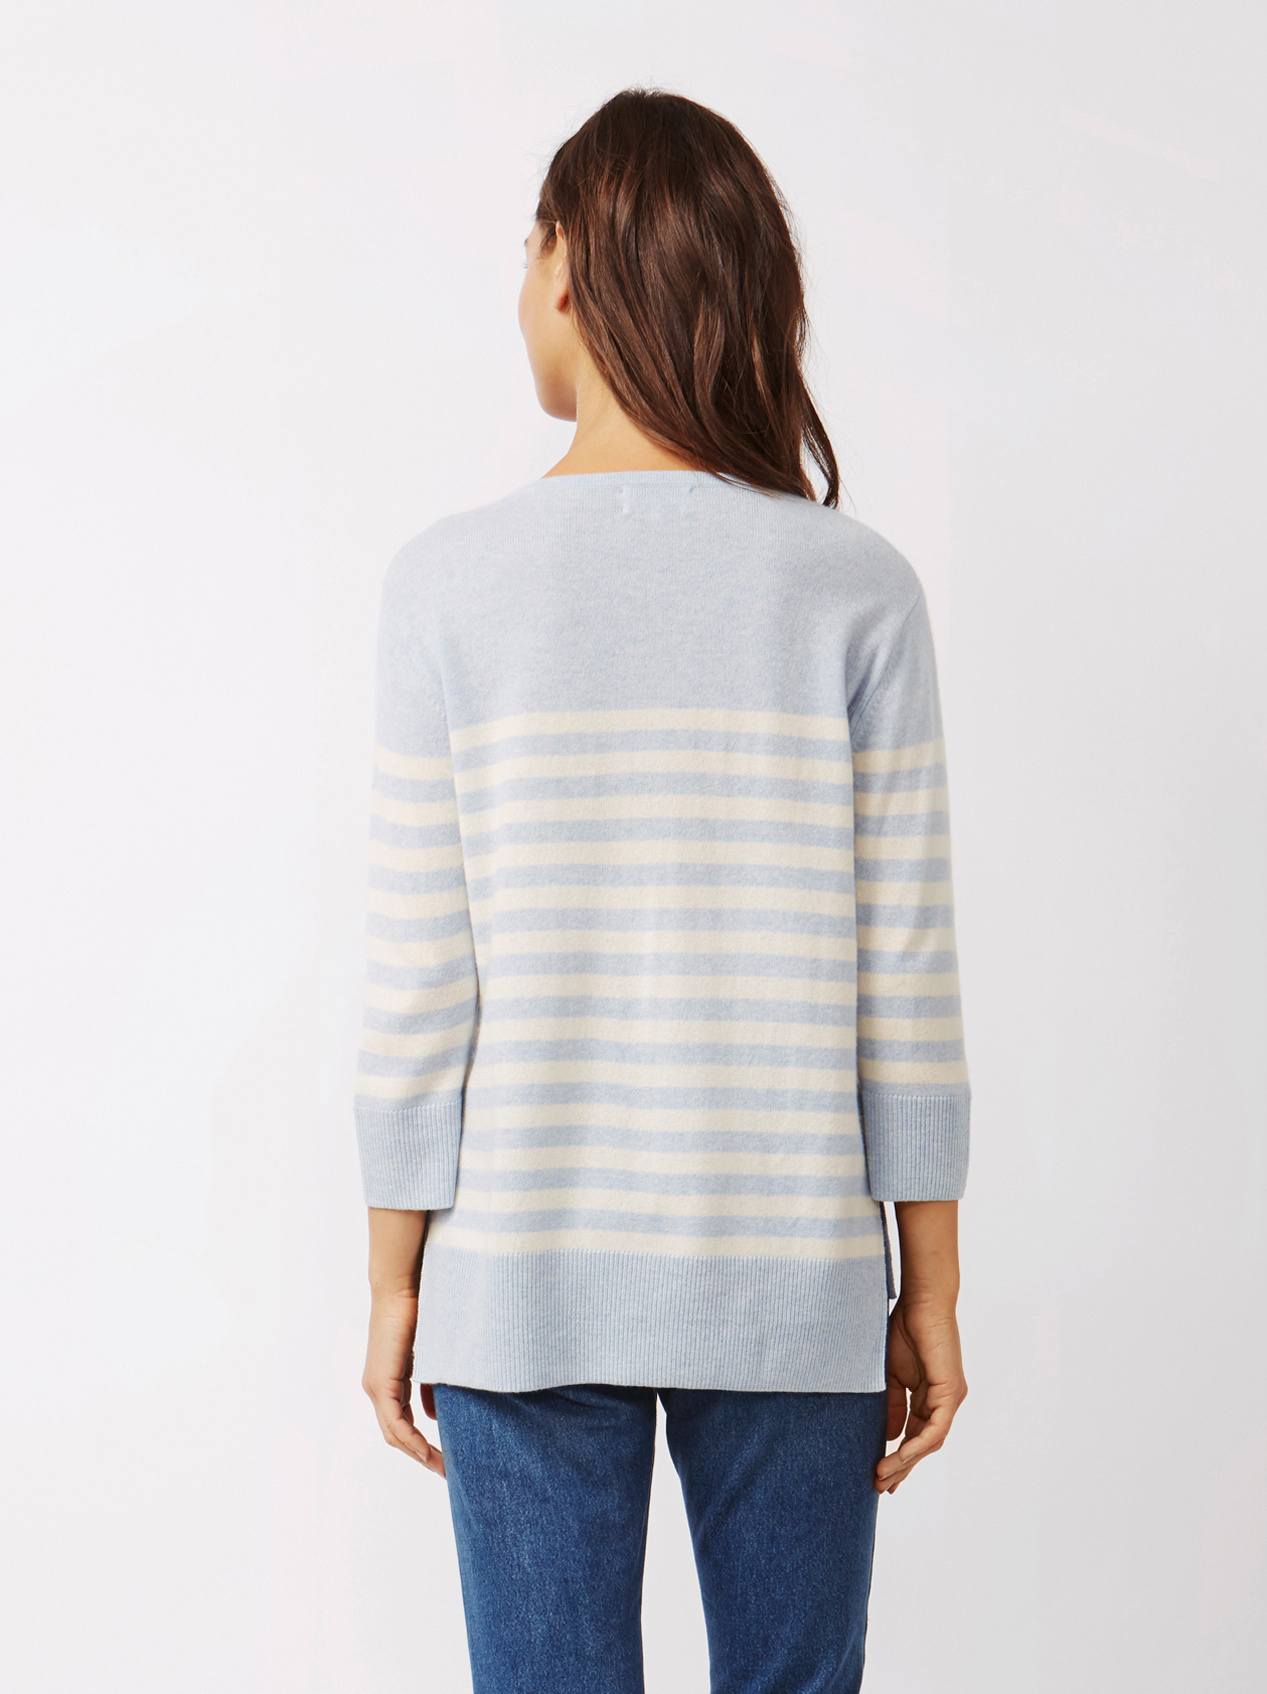 Soft Goat Women's Striped Sweater Light Blue